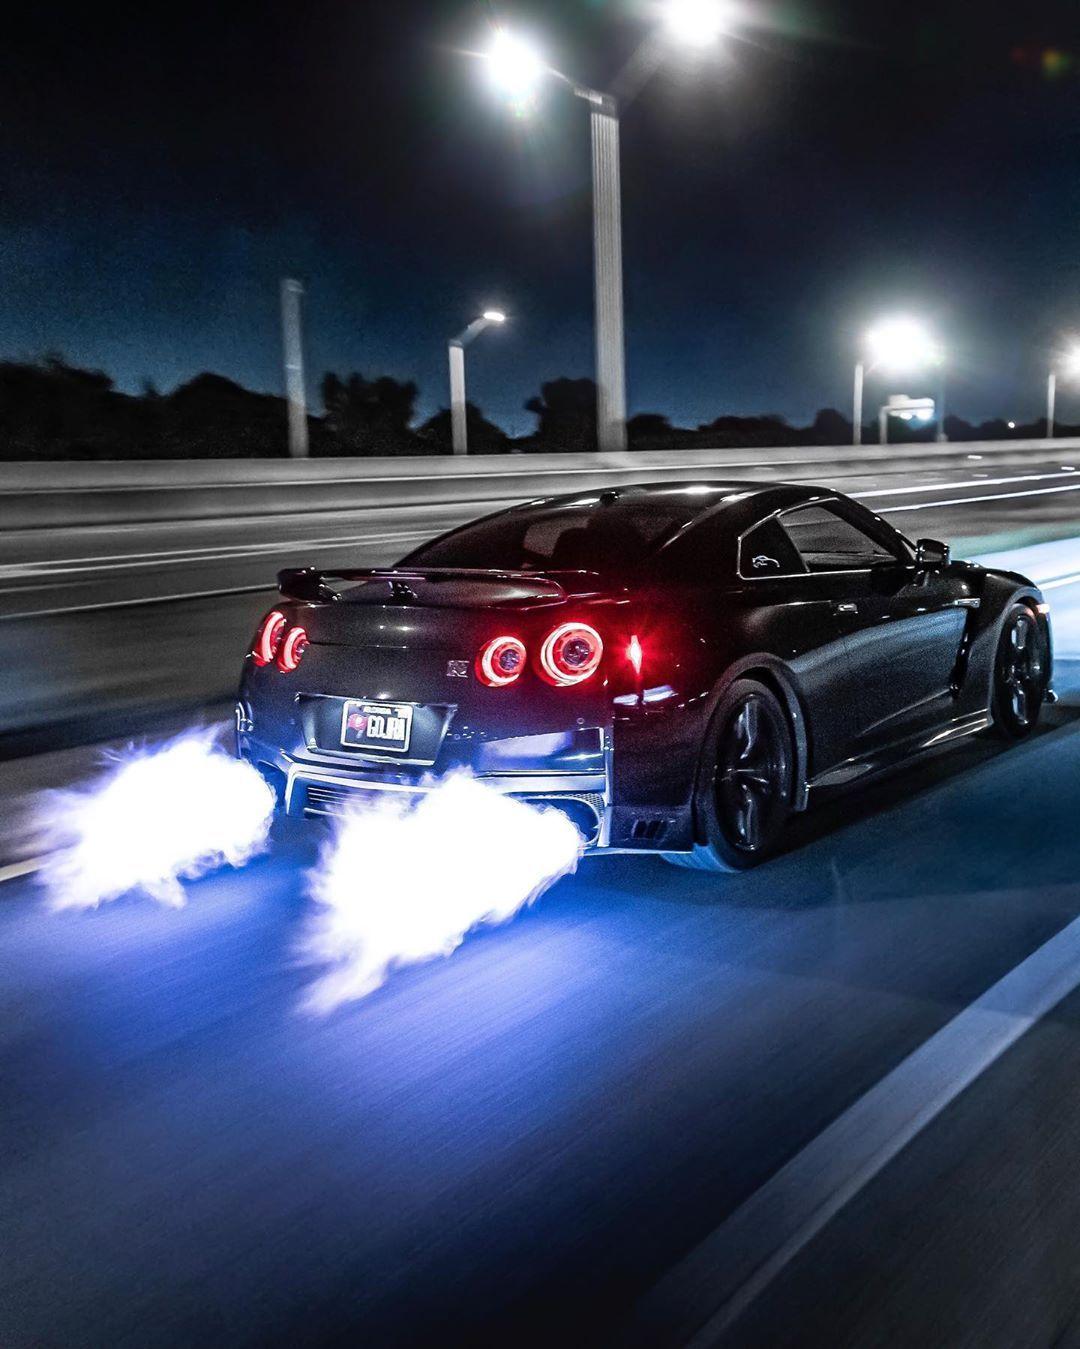 Fire Breathing Godzilla Nissan Skyline Gt R Nissan Gtr Skyline Nissan Gtr Nissan Gtr R34